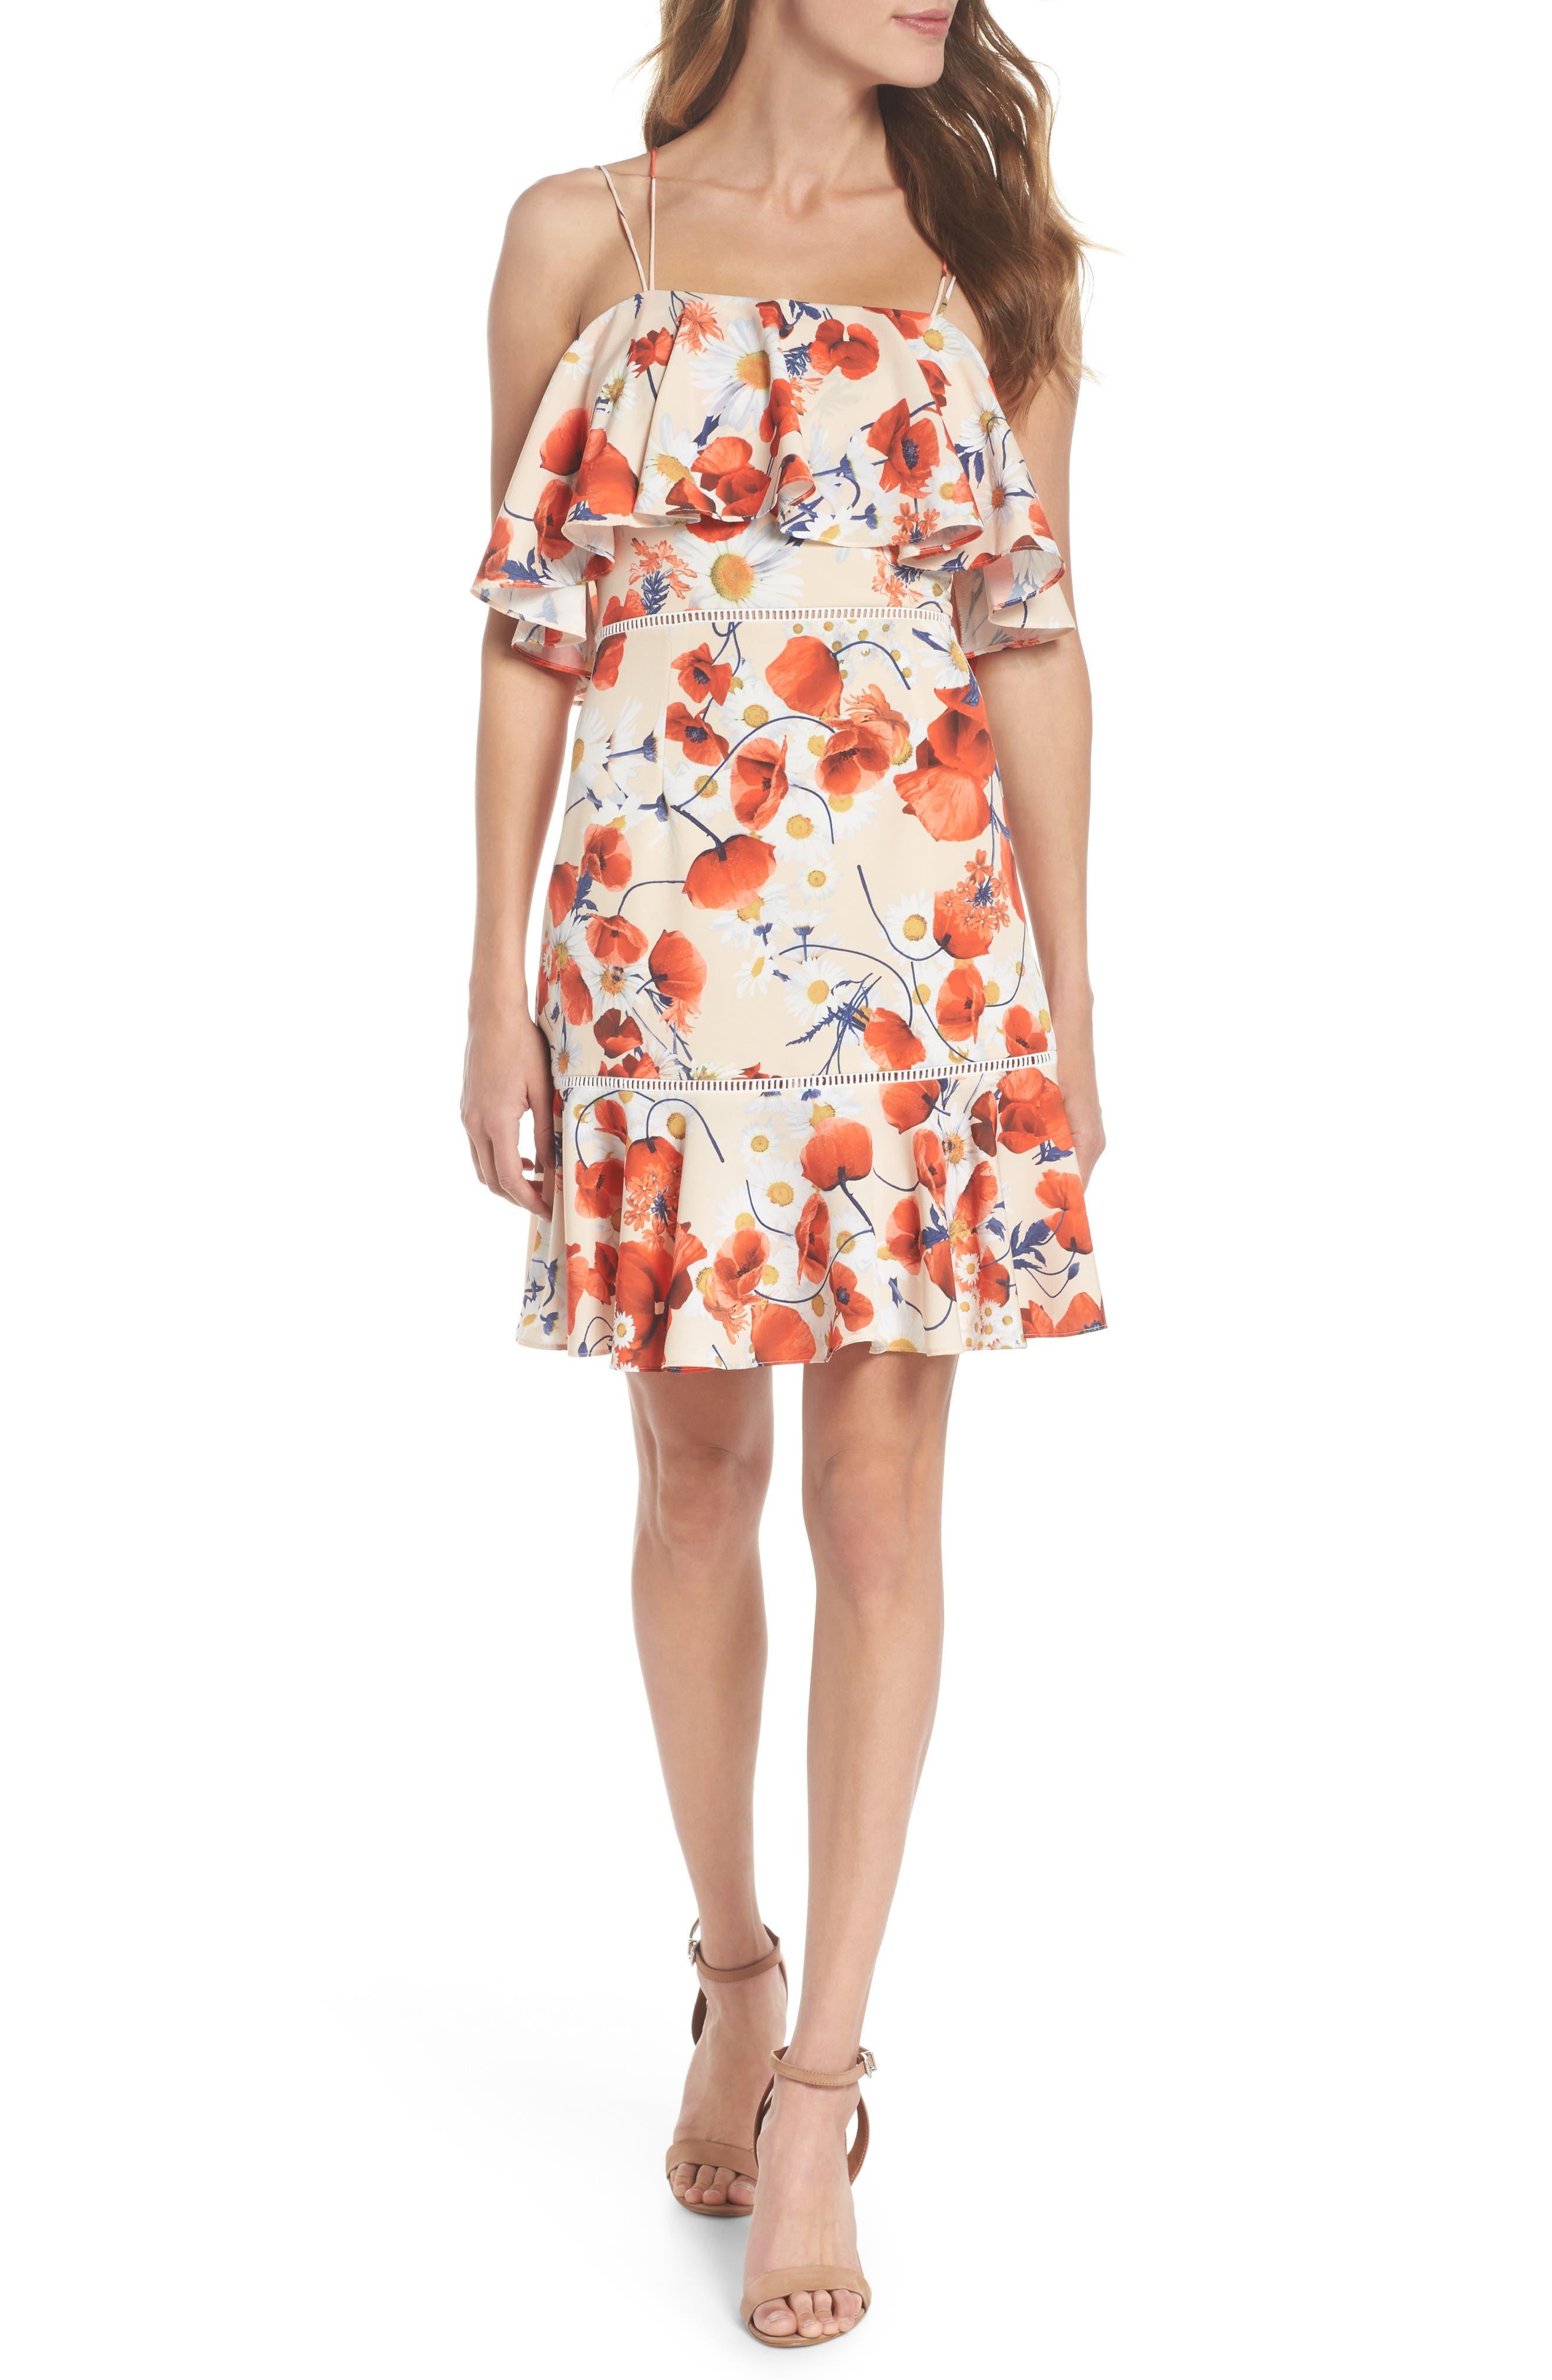 NSR Lola Printed Poplin Dress